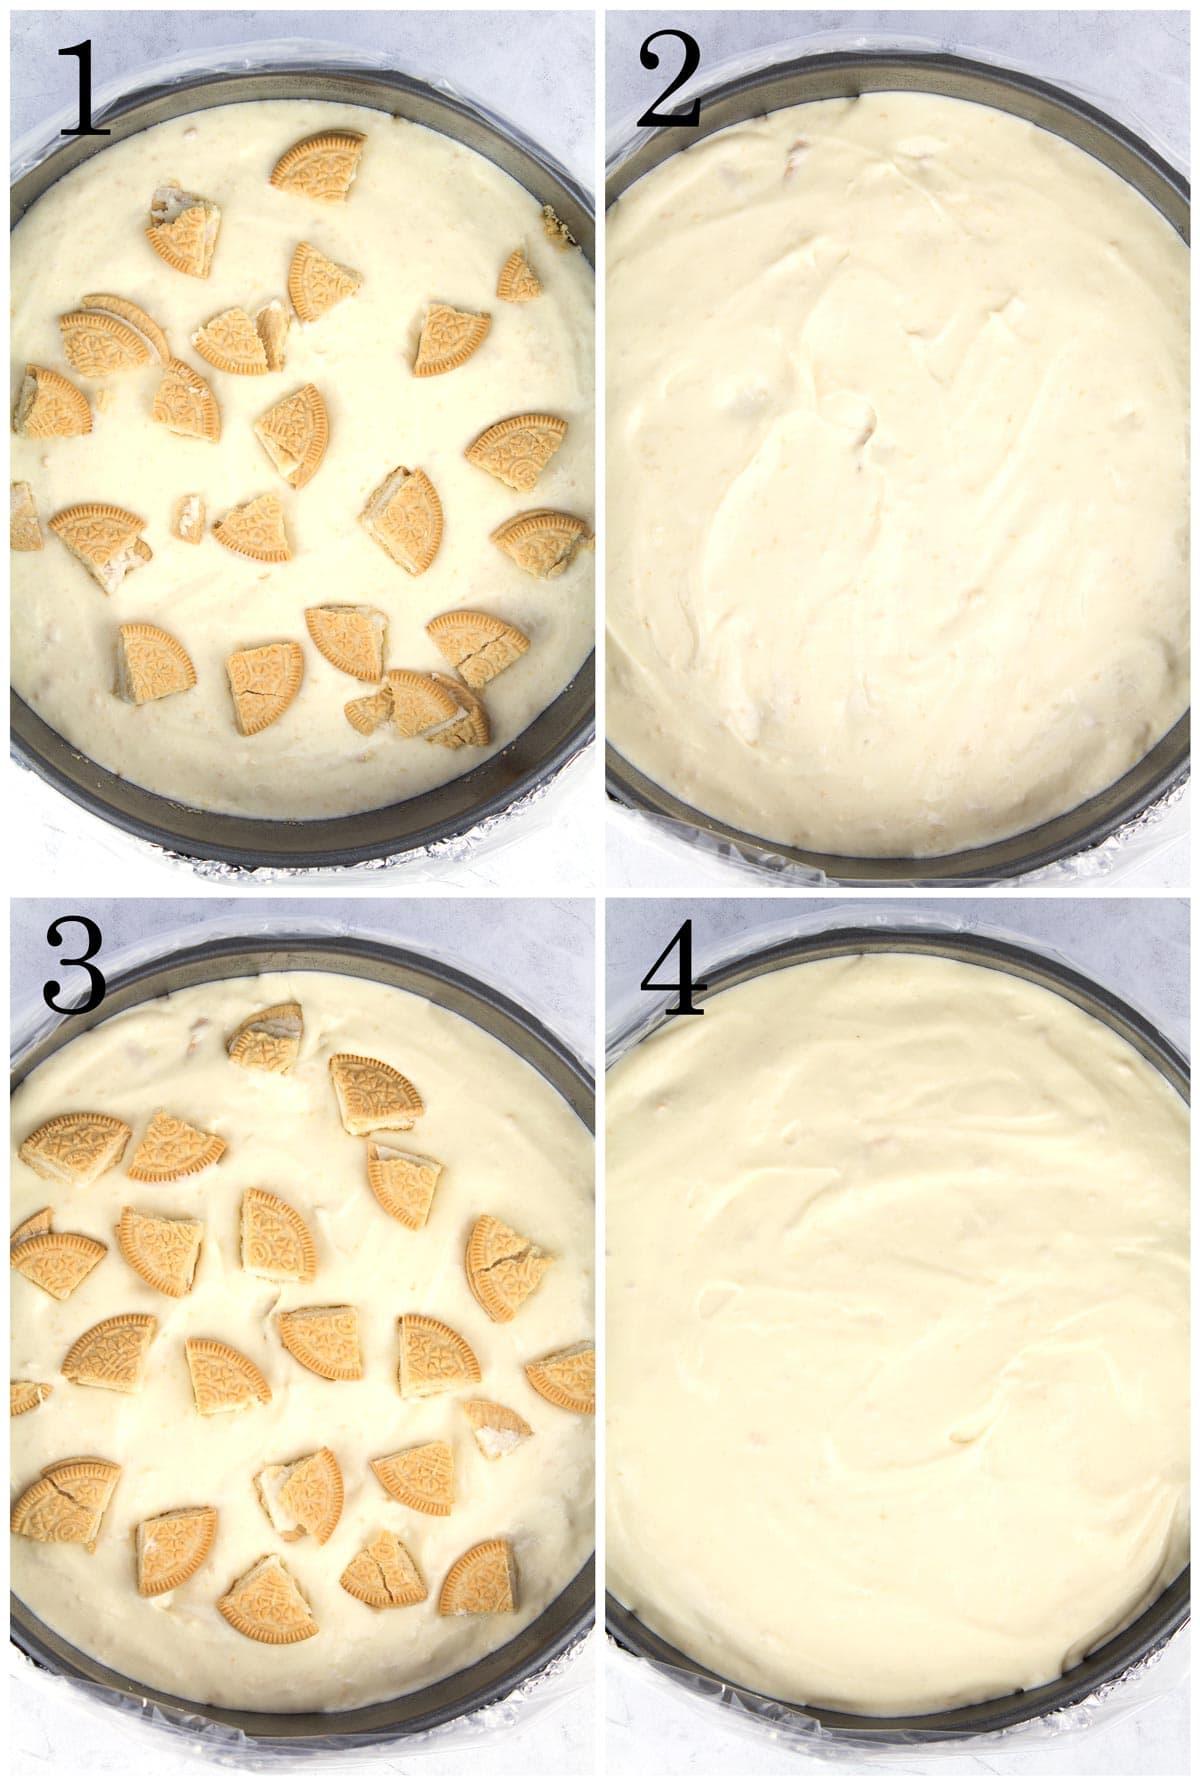 Layering the vanilla Oreo cheesecake batter with Golden Oreo chunks.